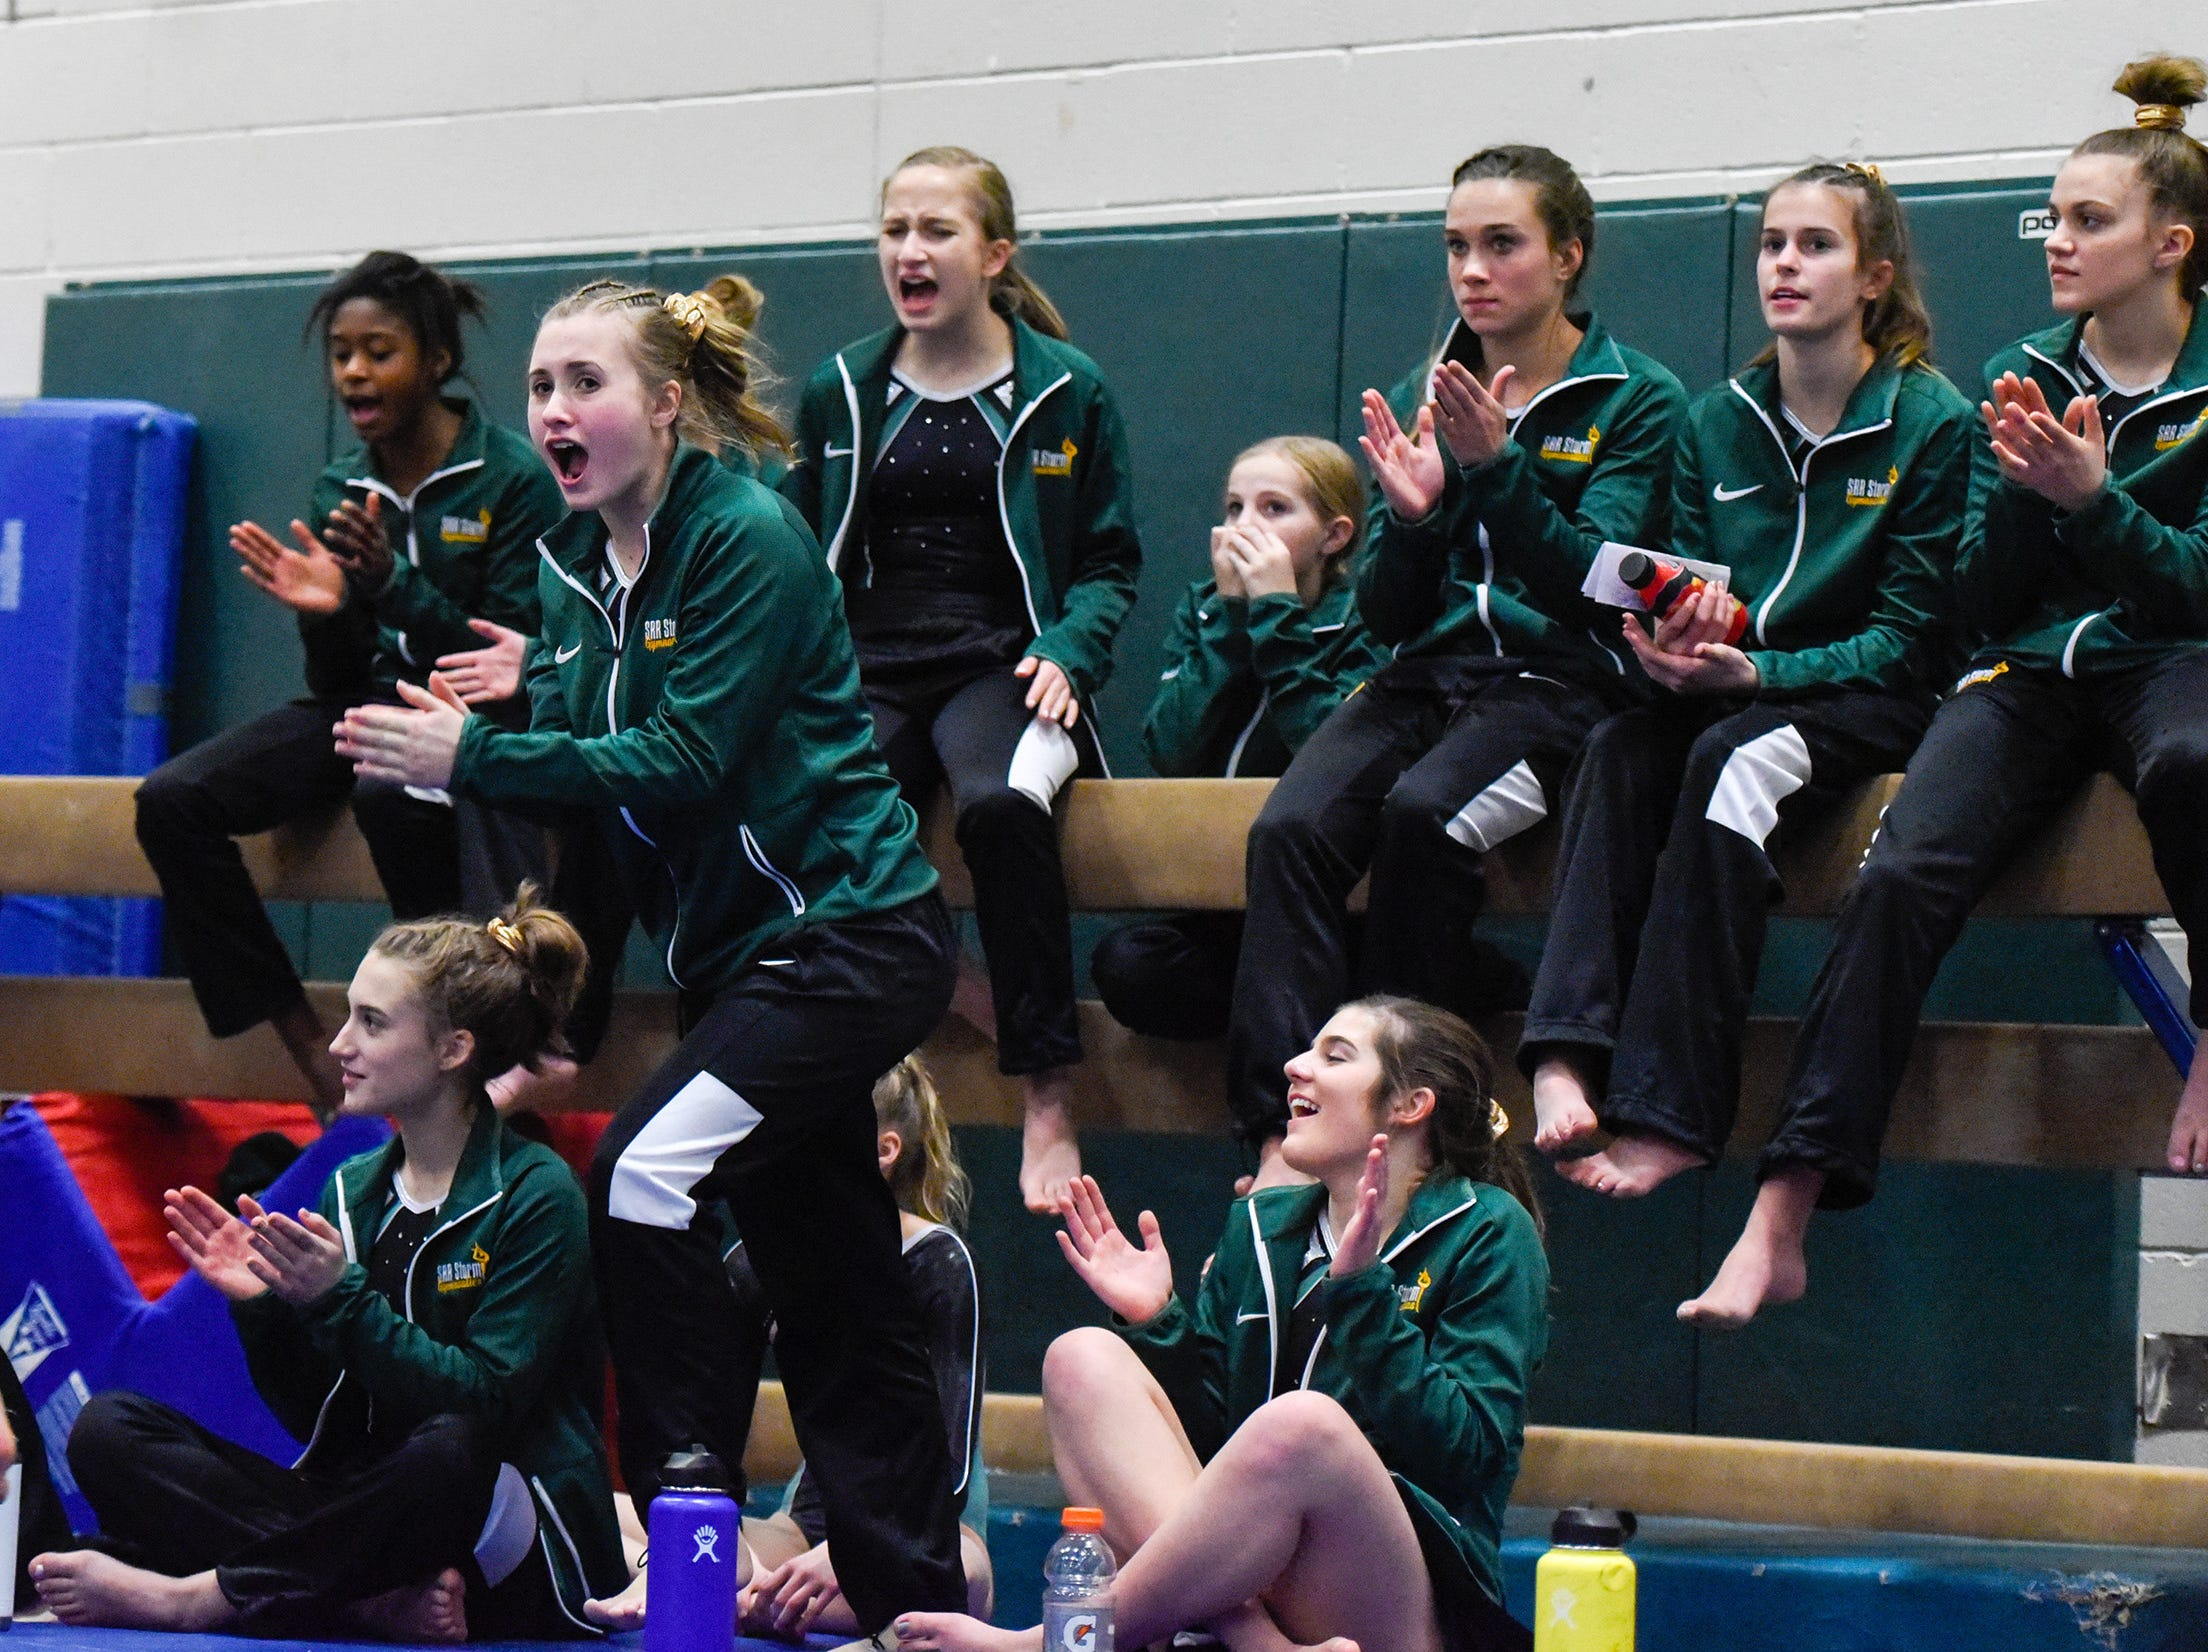 Sauk Rapids gymnasts cheer for a teammate on the beam Thursday, Jan. 3, at the Sauk Rapids-Rice High School.